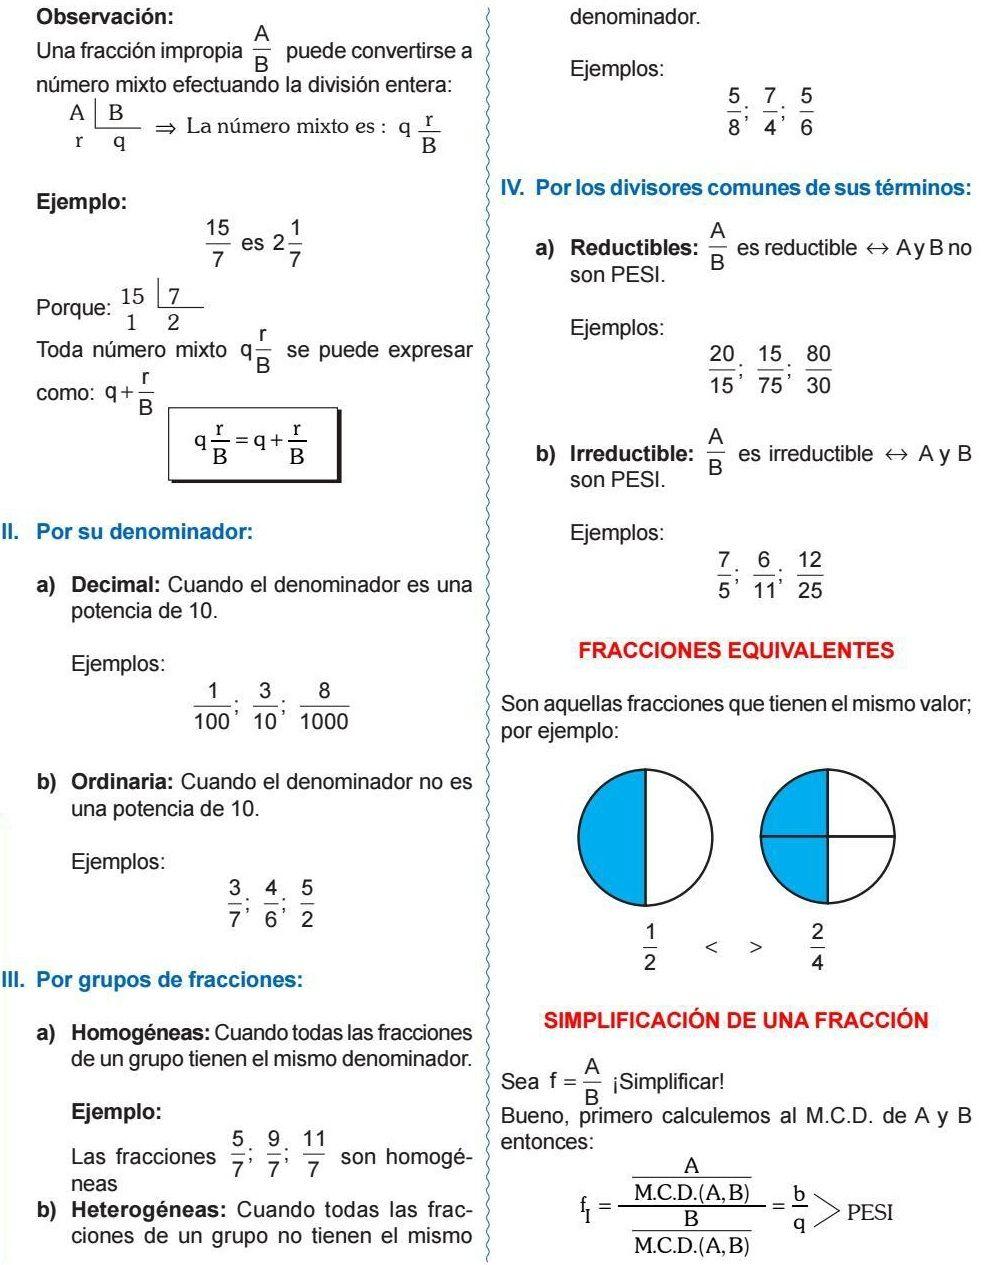 Fracciones Equivalentes Simplificacion De Una Fraccion Math Getting A Kitten How To Get